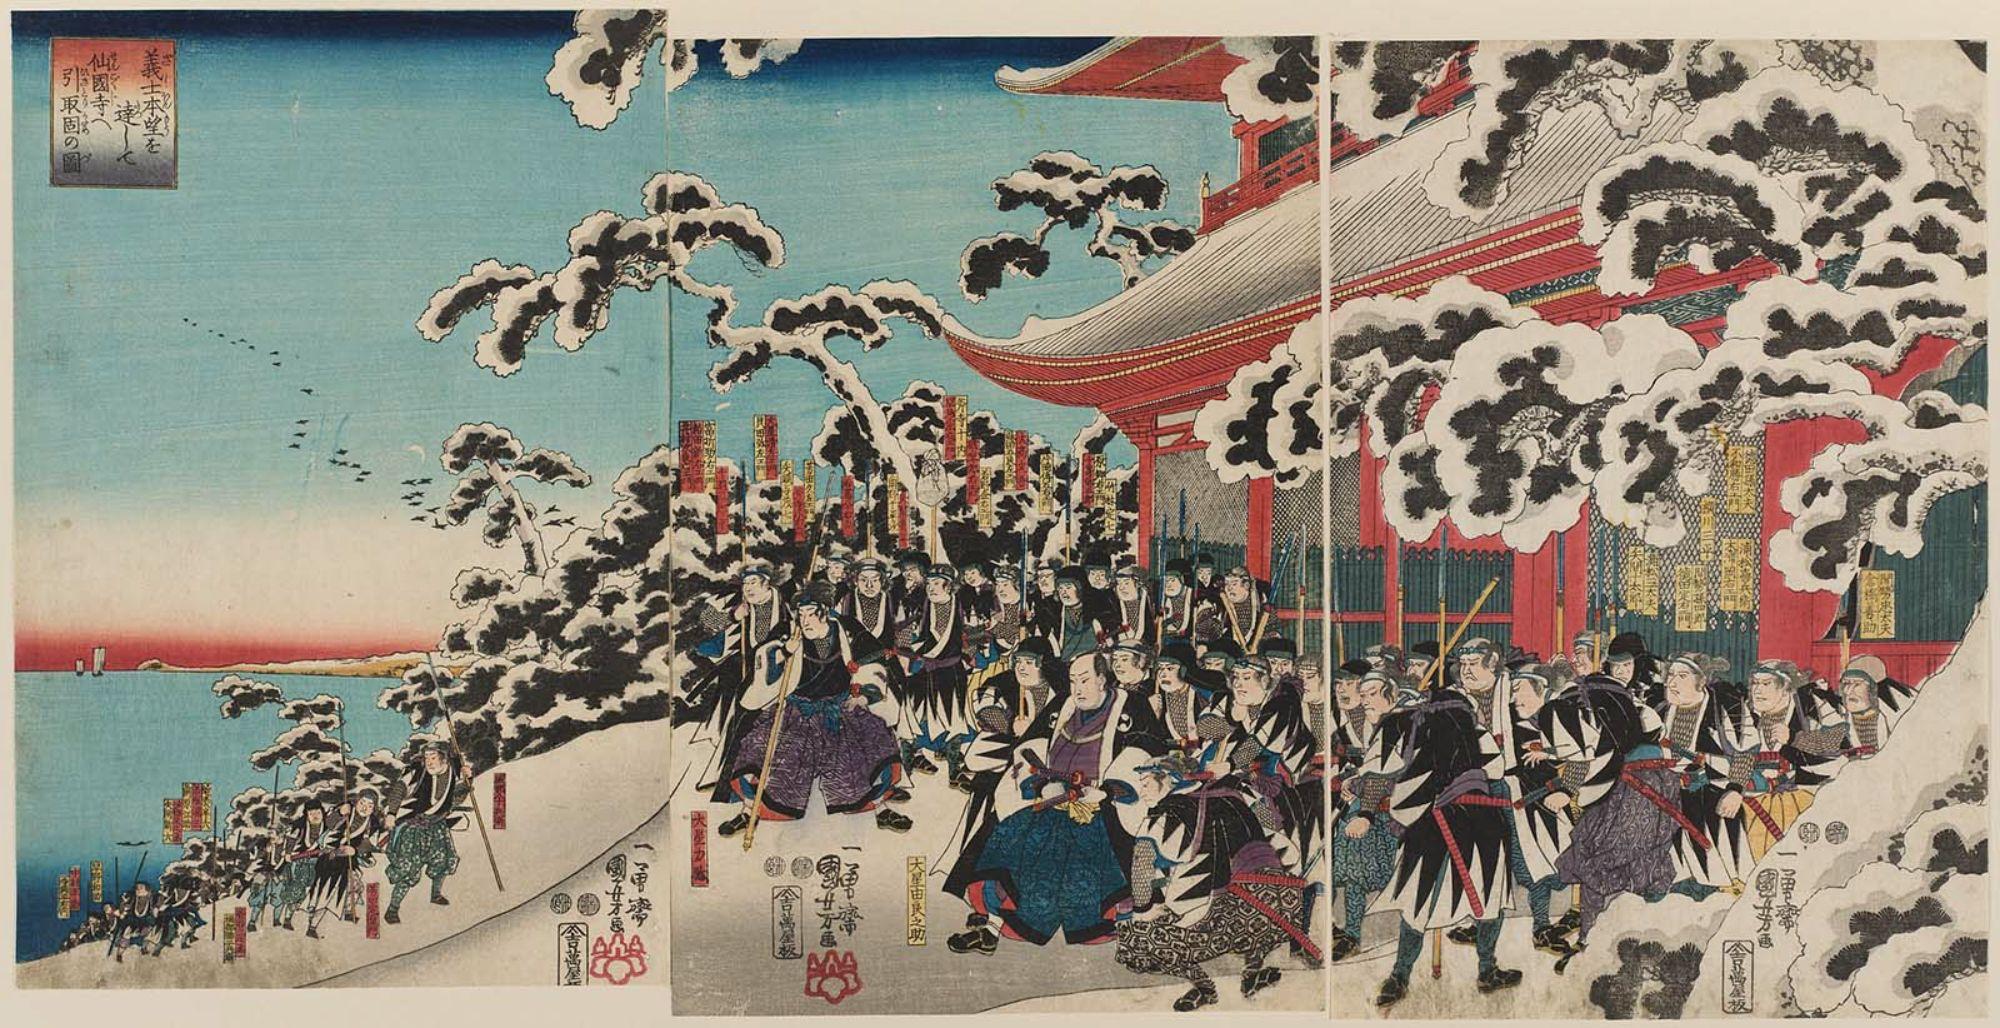 Japanese Ukiyo-e Woodblock Print Book 5-293 Utagawa Kunisada 1856